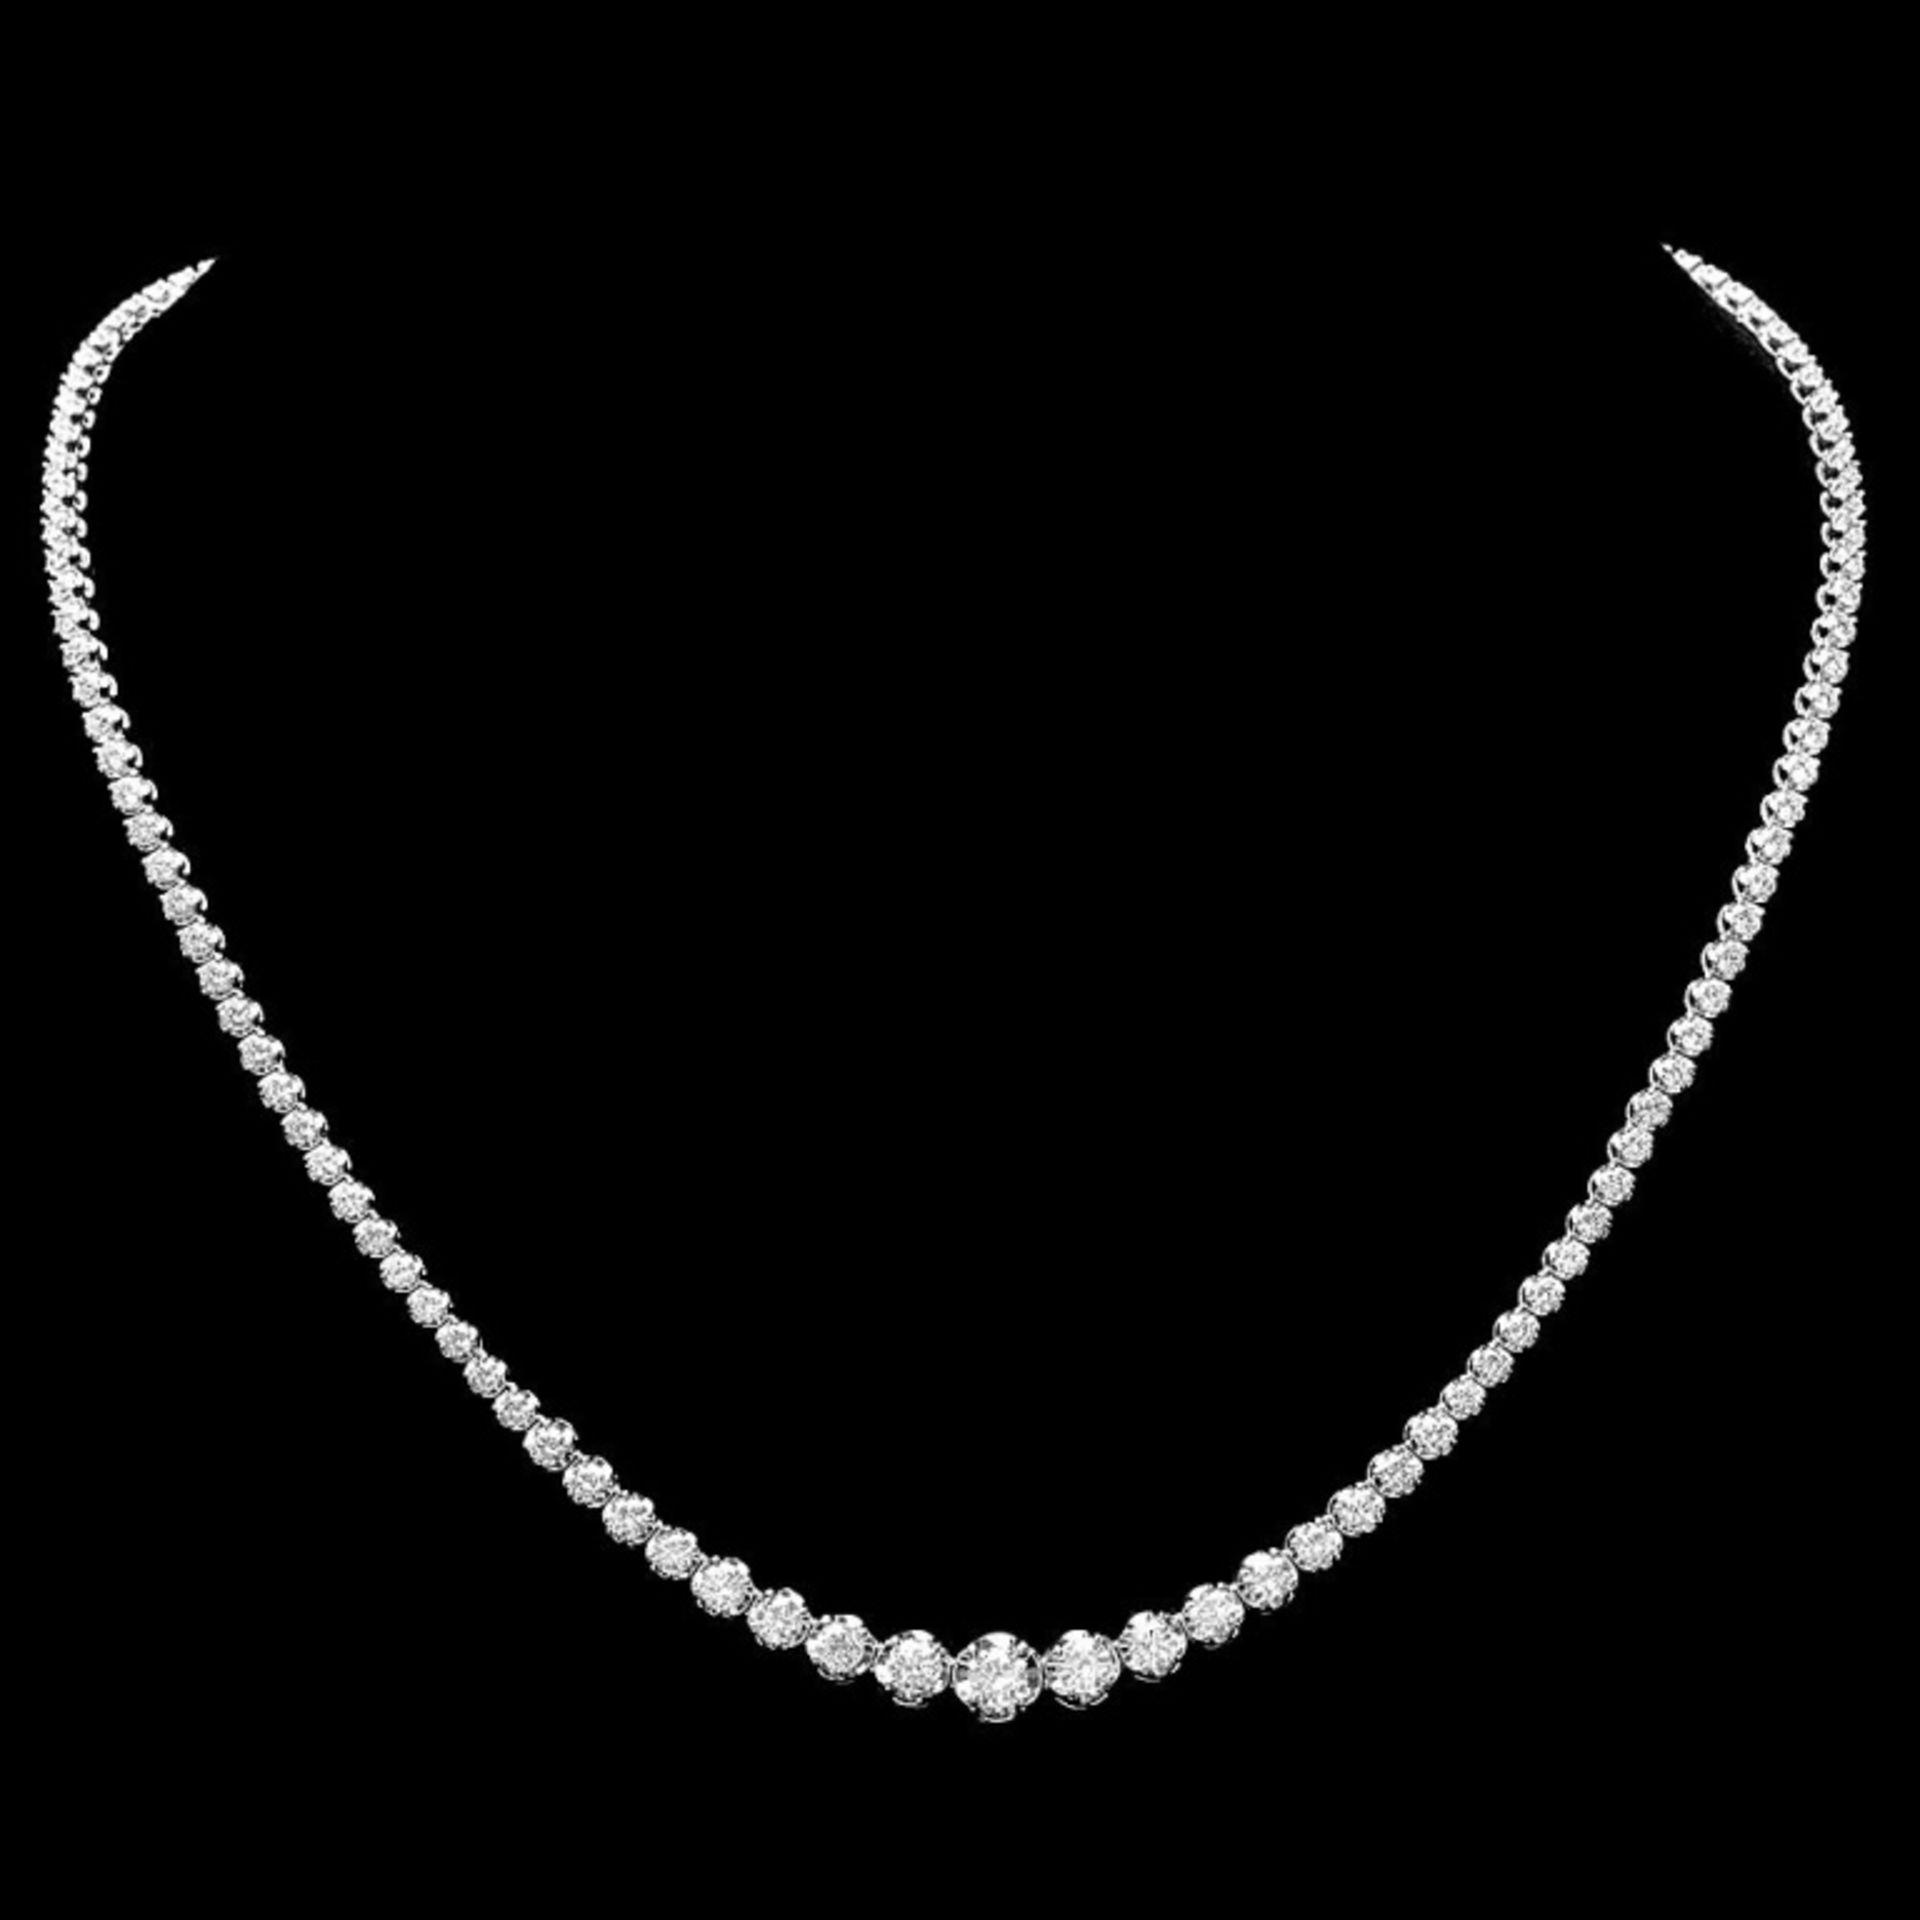 18k White Gold 7.00ct Diamond Necklace